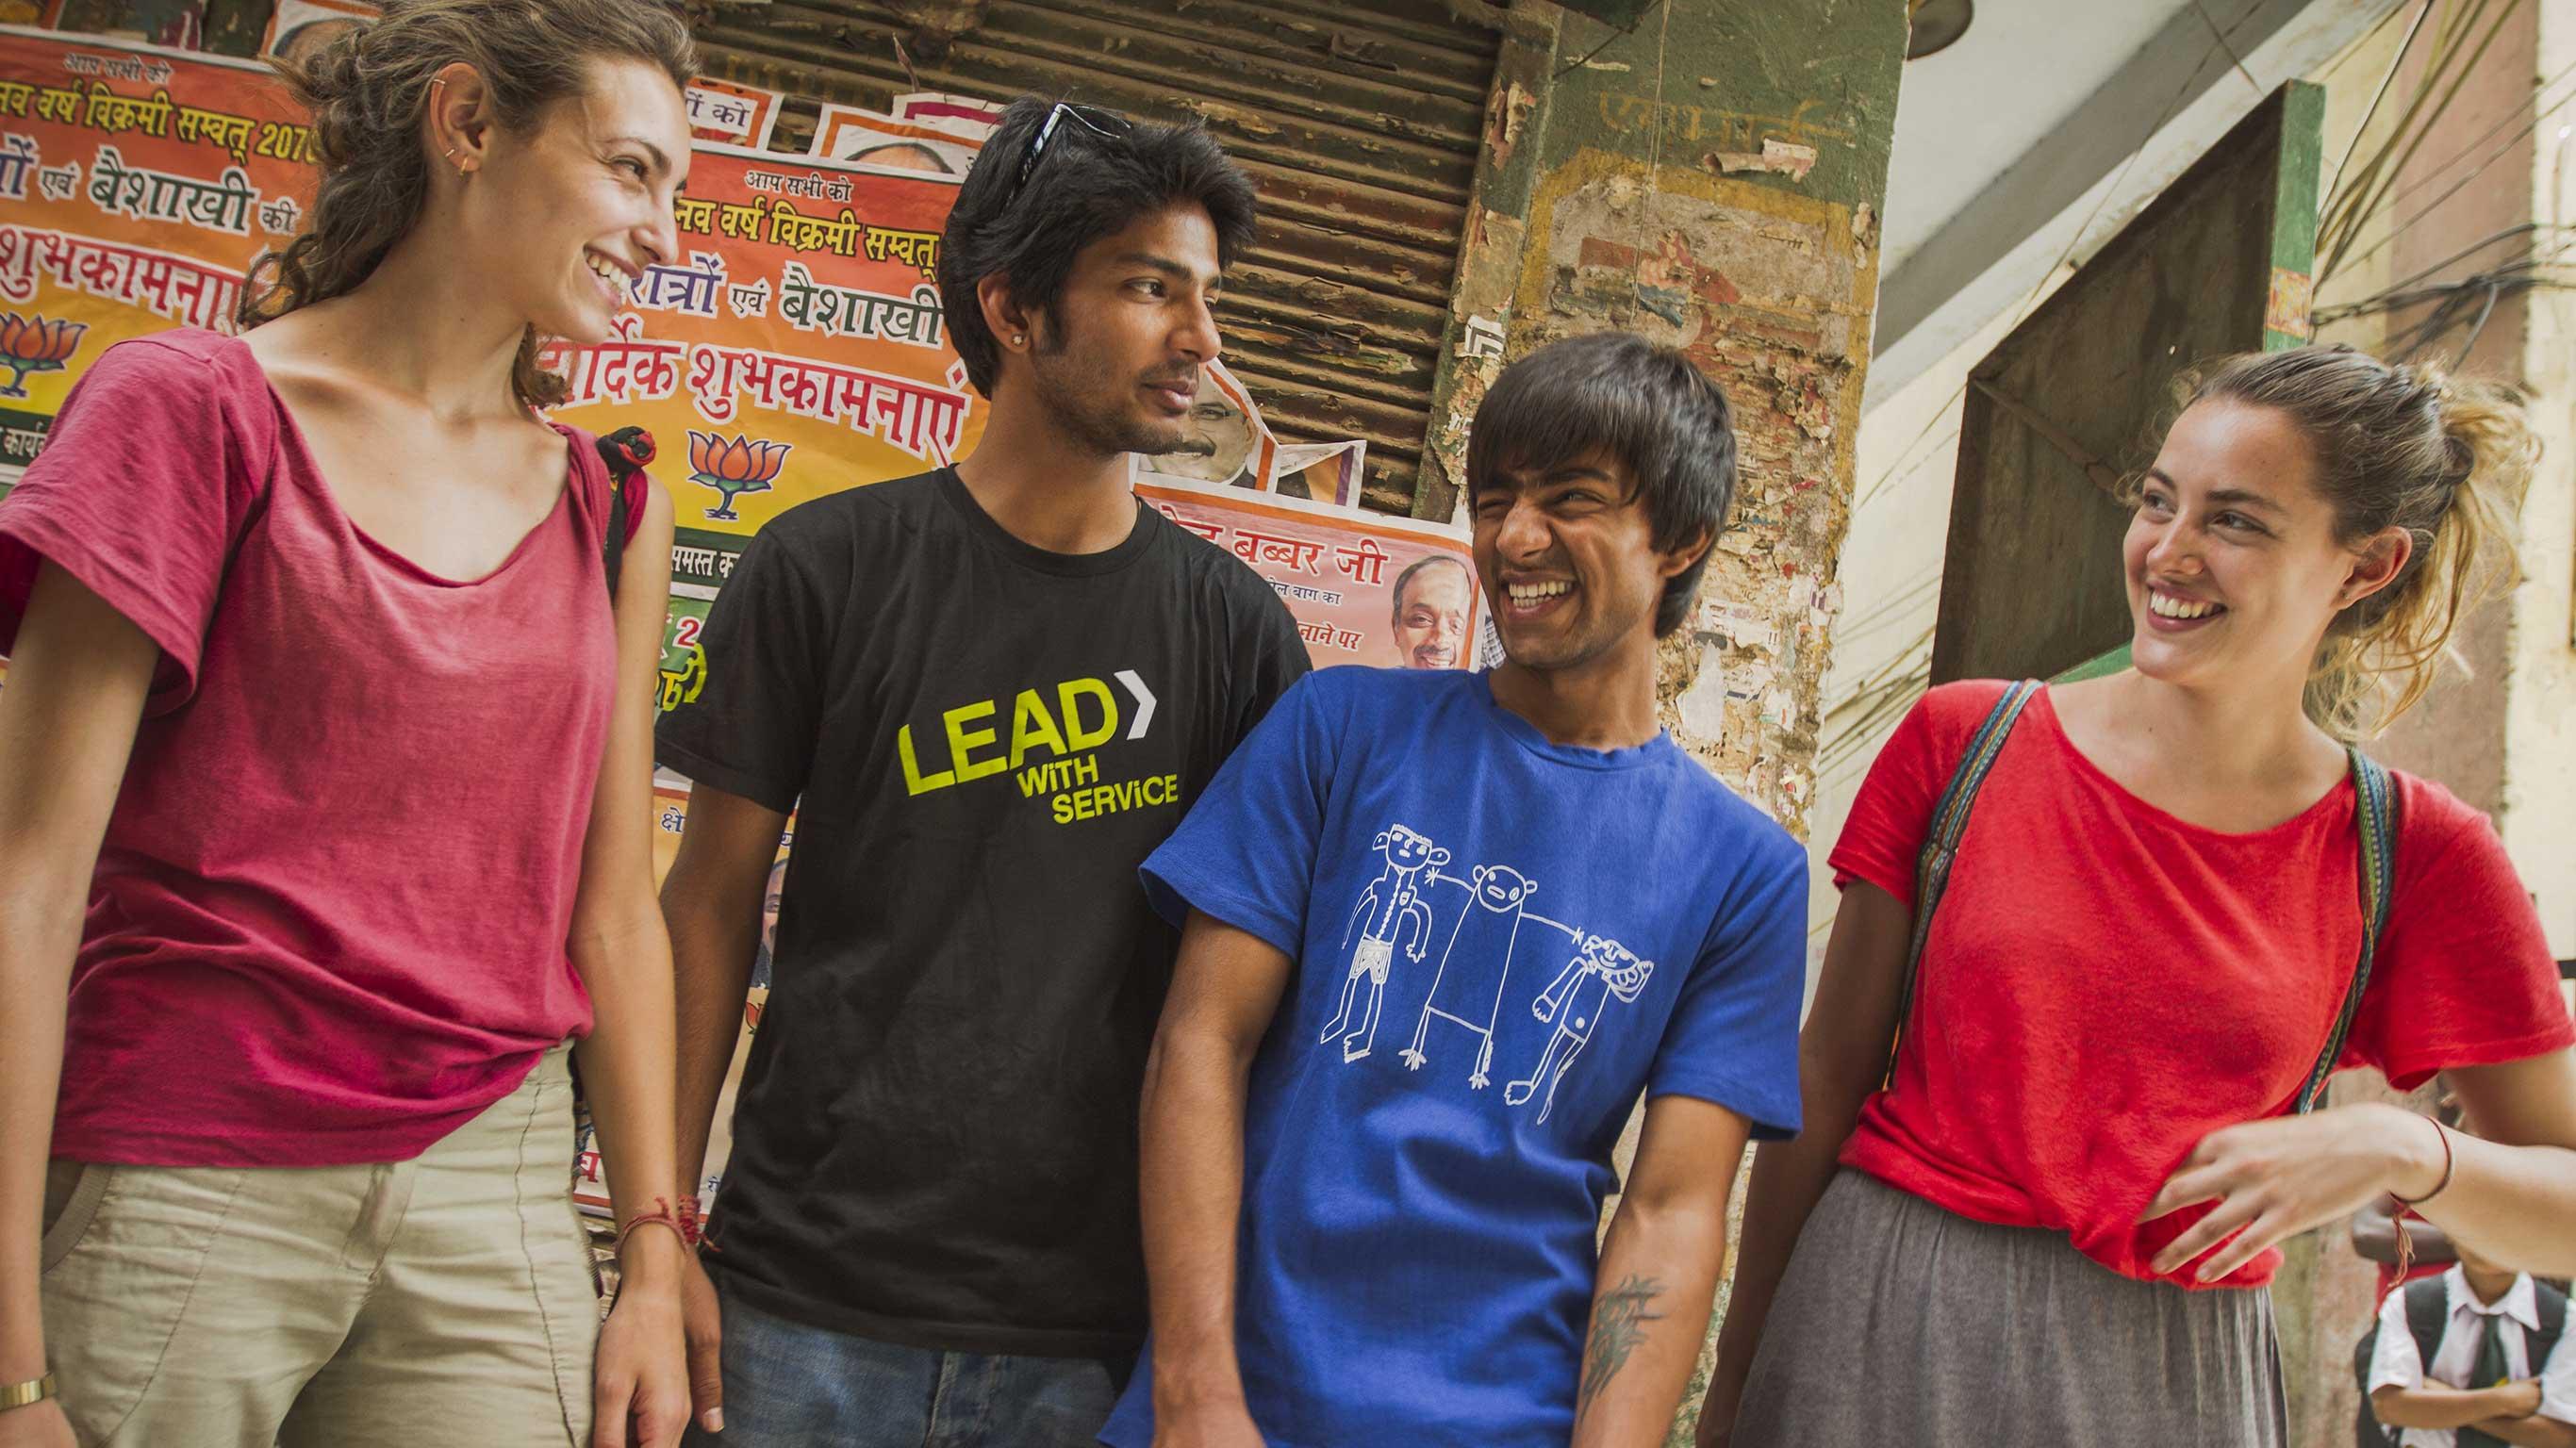 Mini-Abenteuer Delhi 18-to-Thirtysomethings